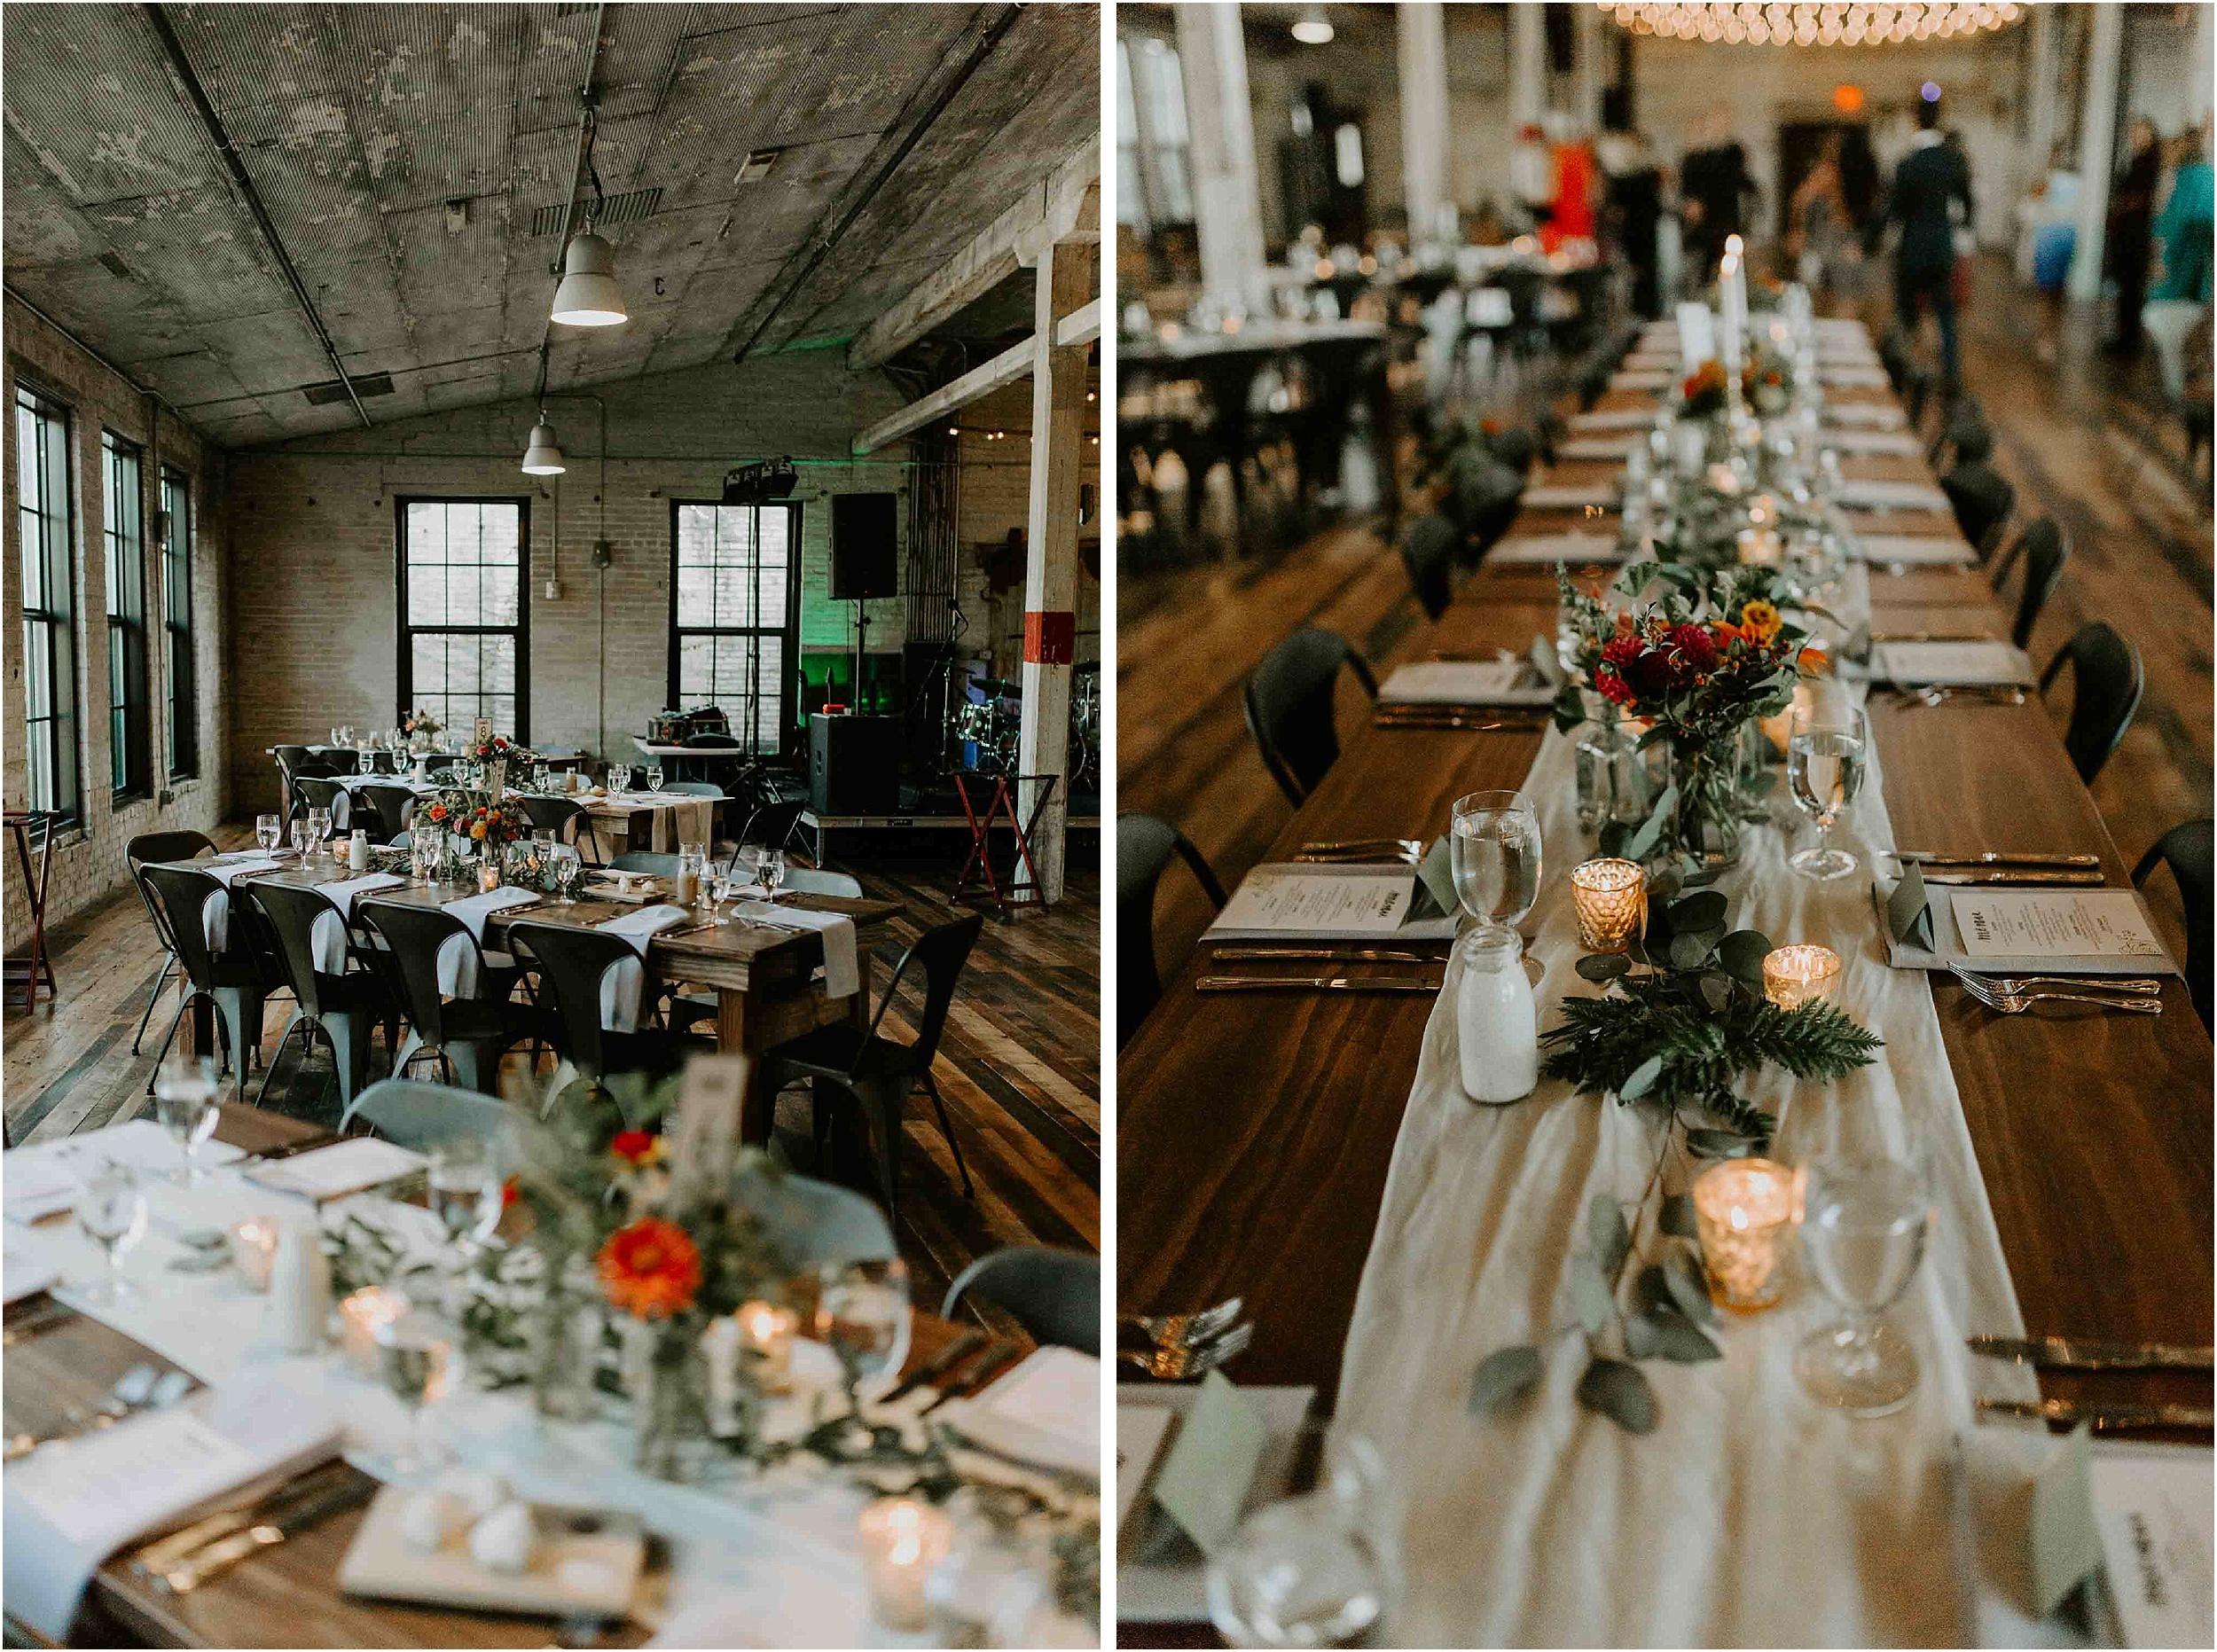 journeyman_distillery_wedding_photographer_chicago_il_wright_photographs-4125.jpg